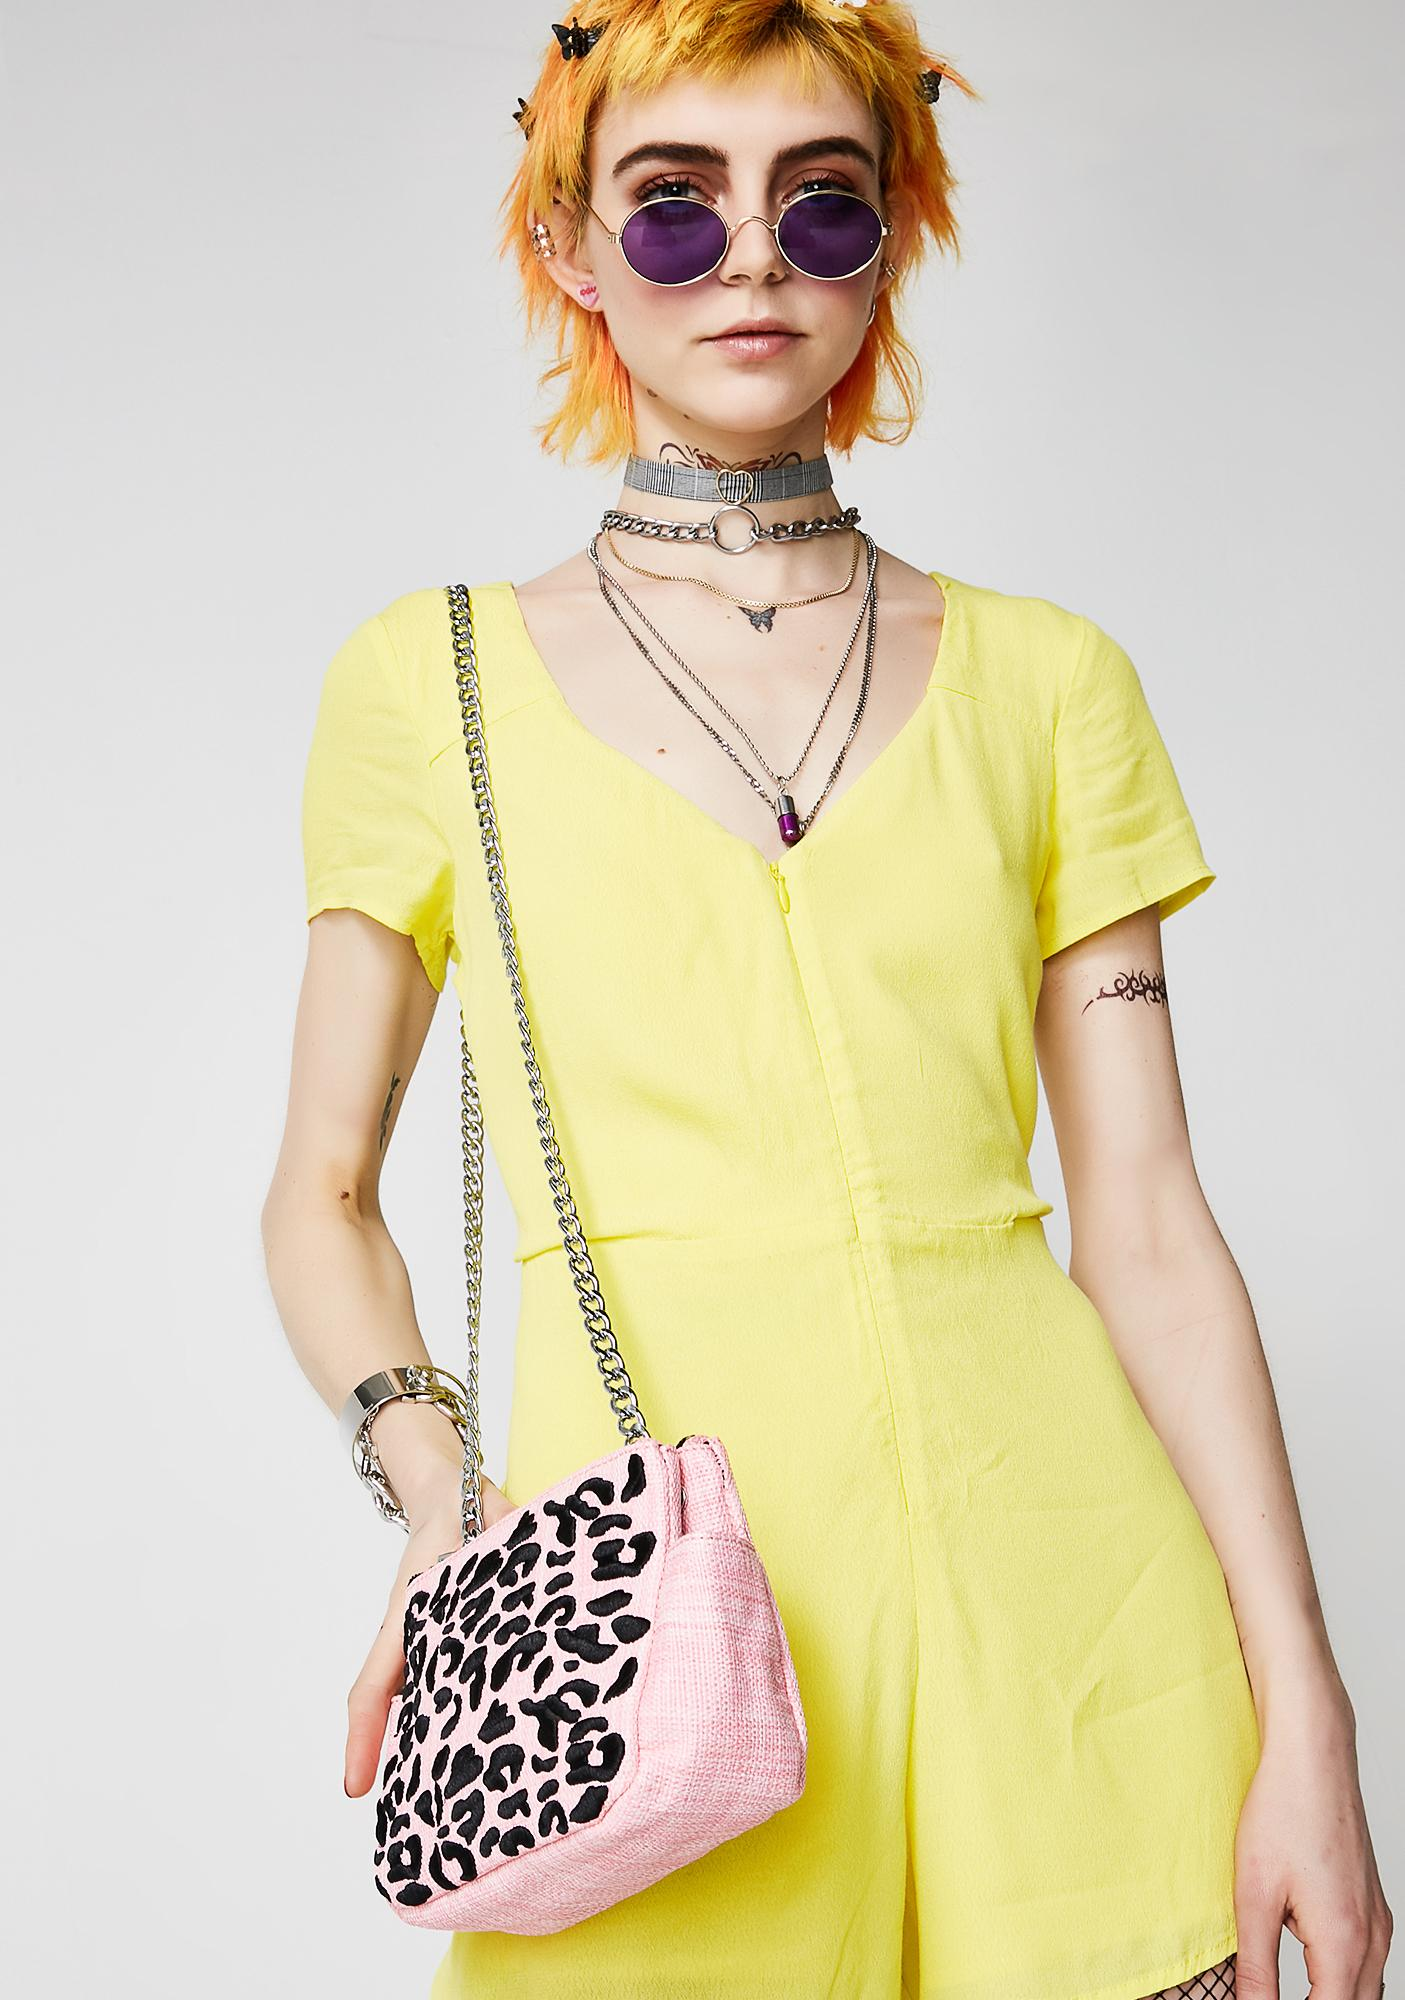 Skinnydip Leopard Picnic Crossbody Bag